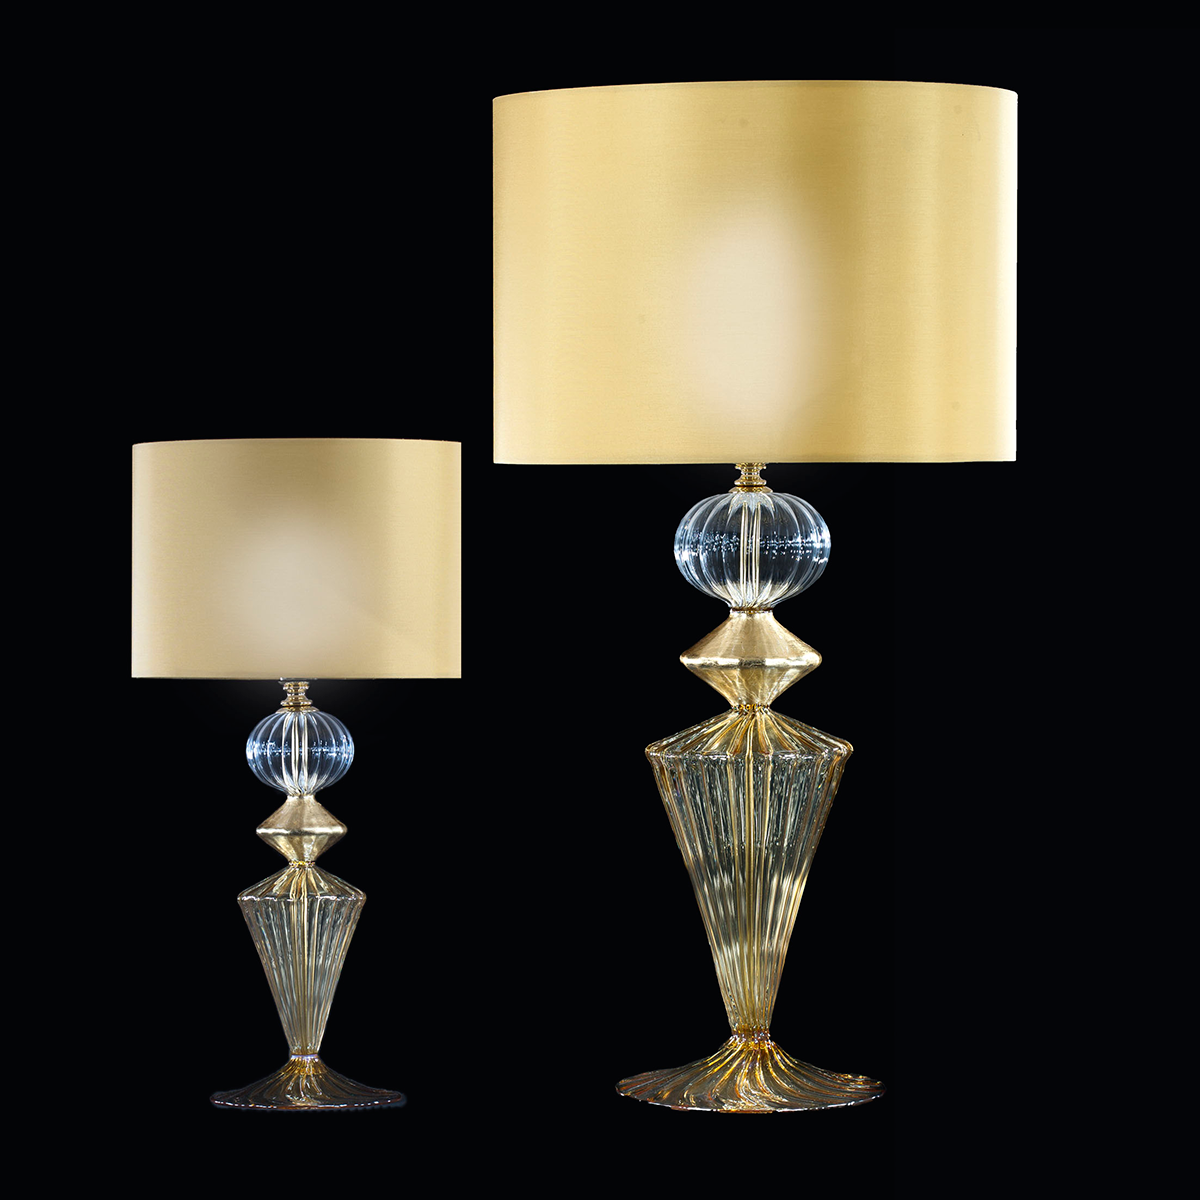 Siria lampada da tavolo 51150/51148 - на 360.ru: цены, описание, характеристики, где купить в Москве.